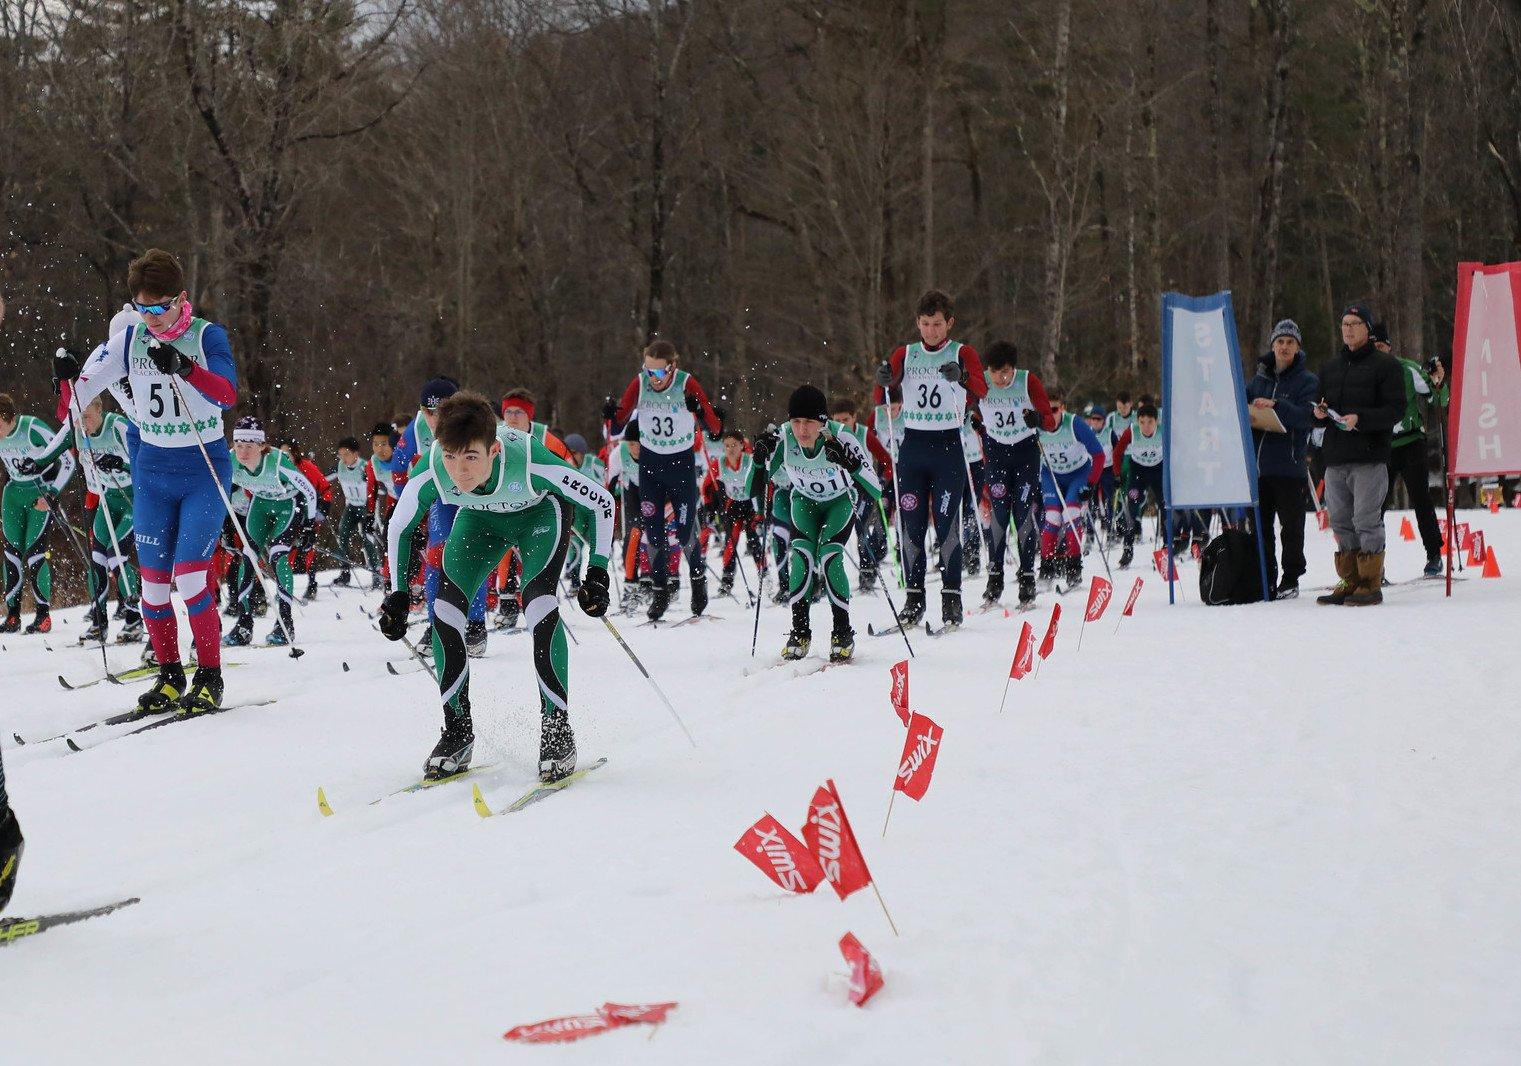 Proctor Academy Athletics Boarding School New England